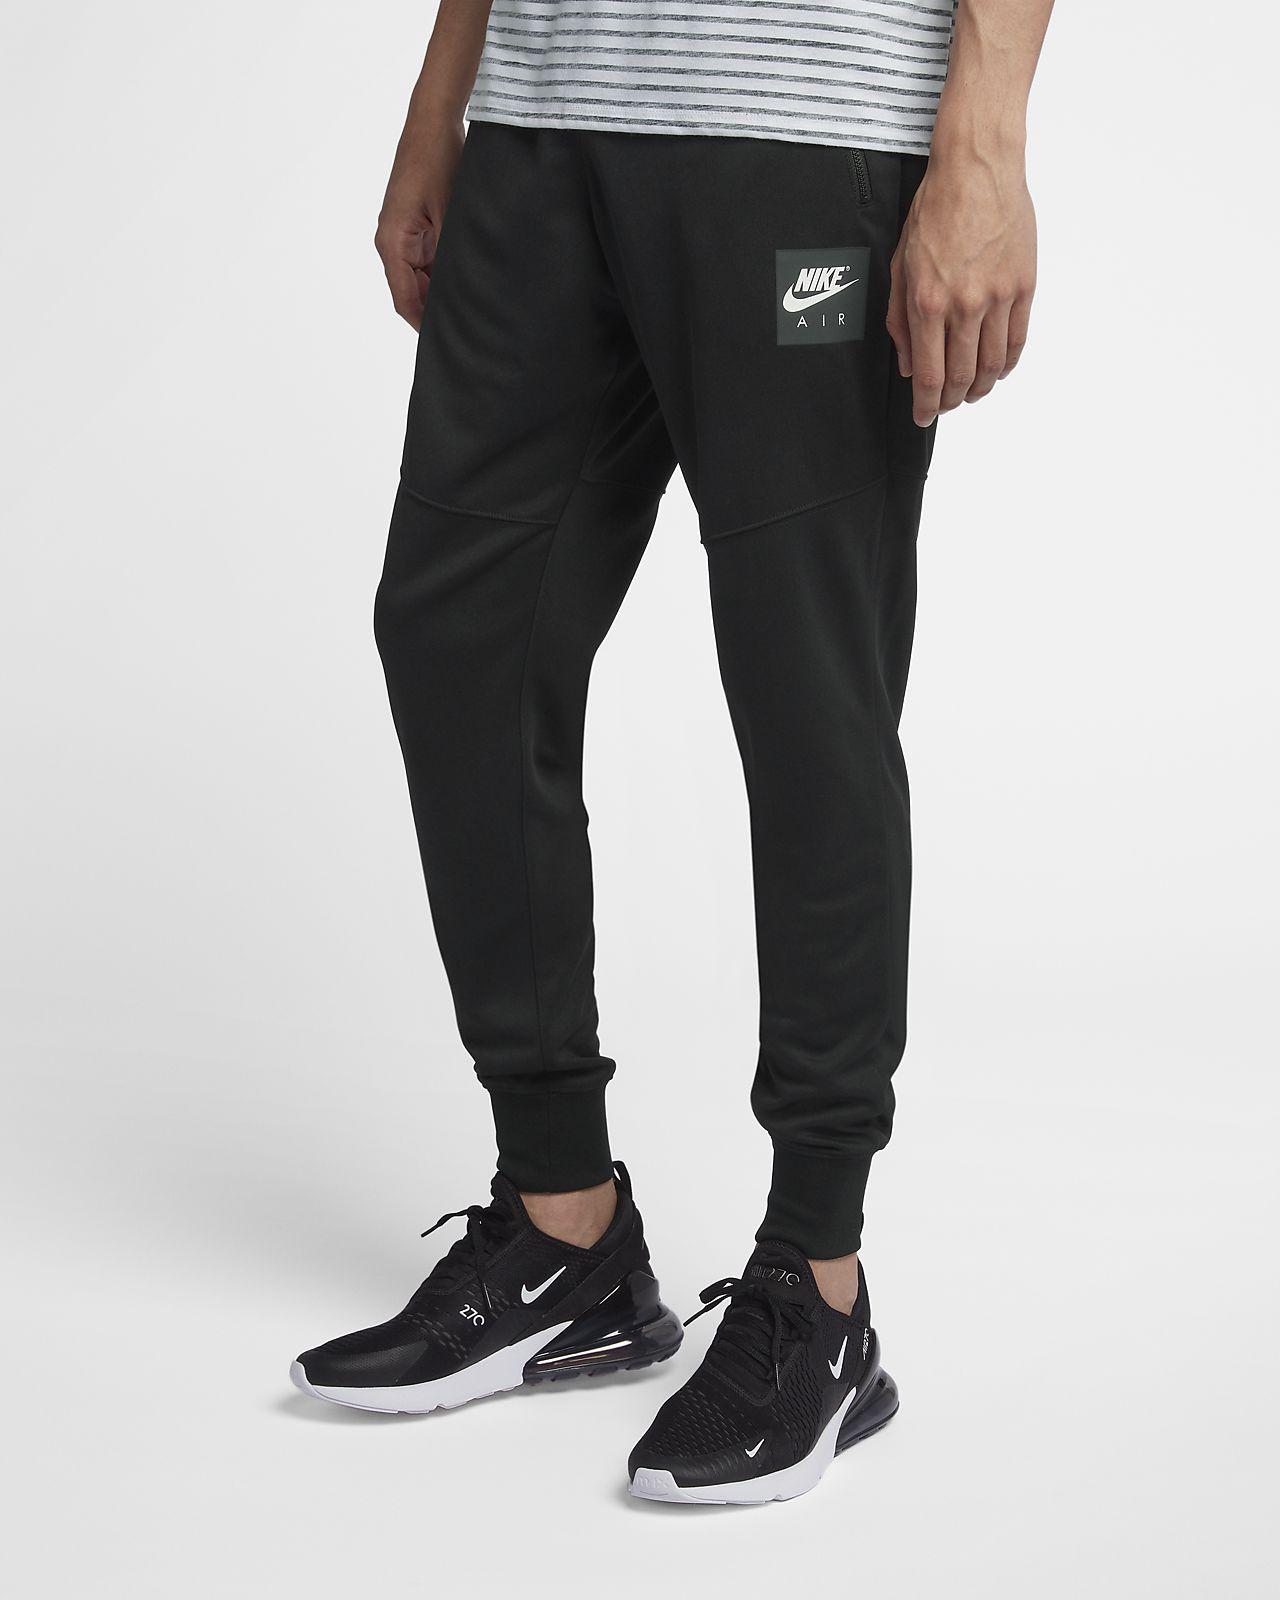 abe349a305db72 Nike Sportswear Air Men s Trousers. Nike.com ID